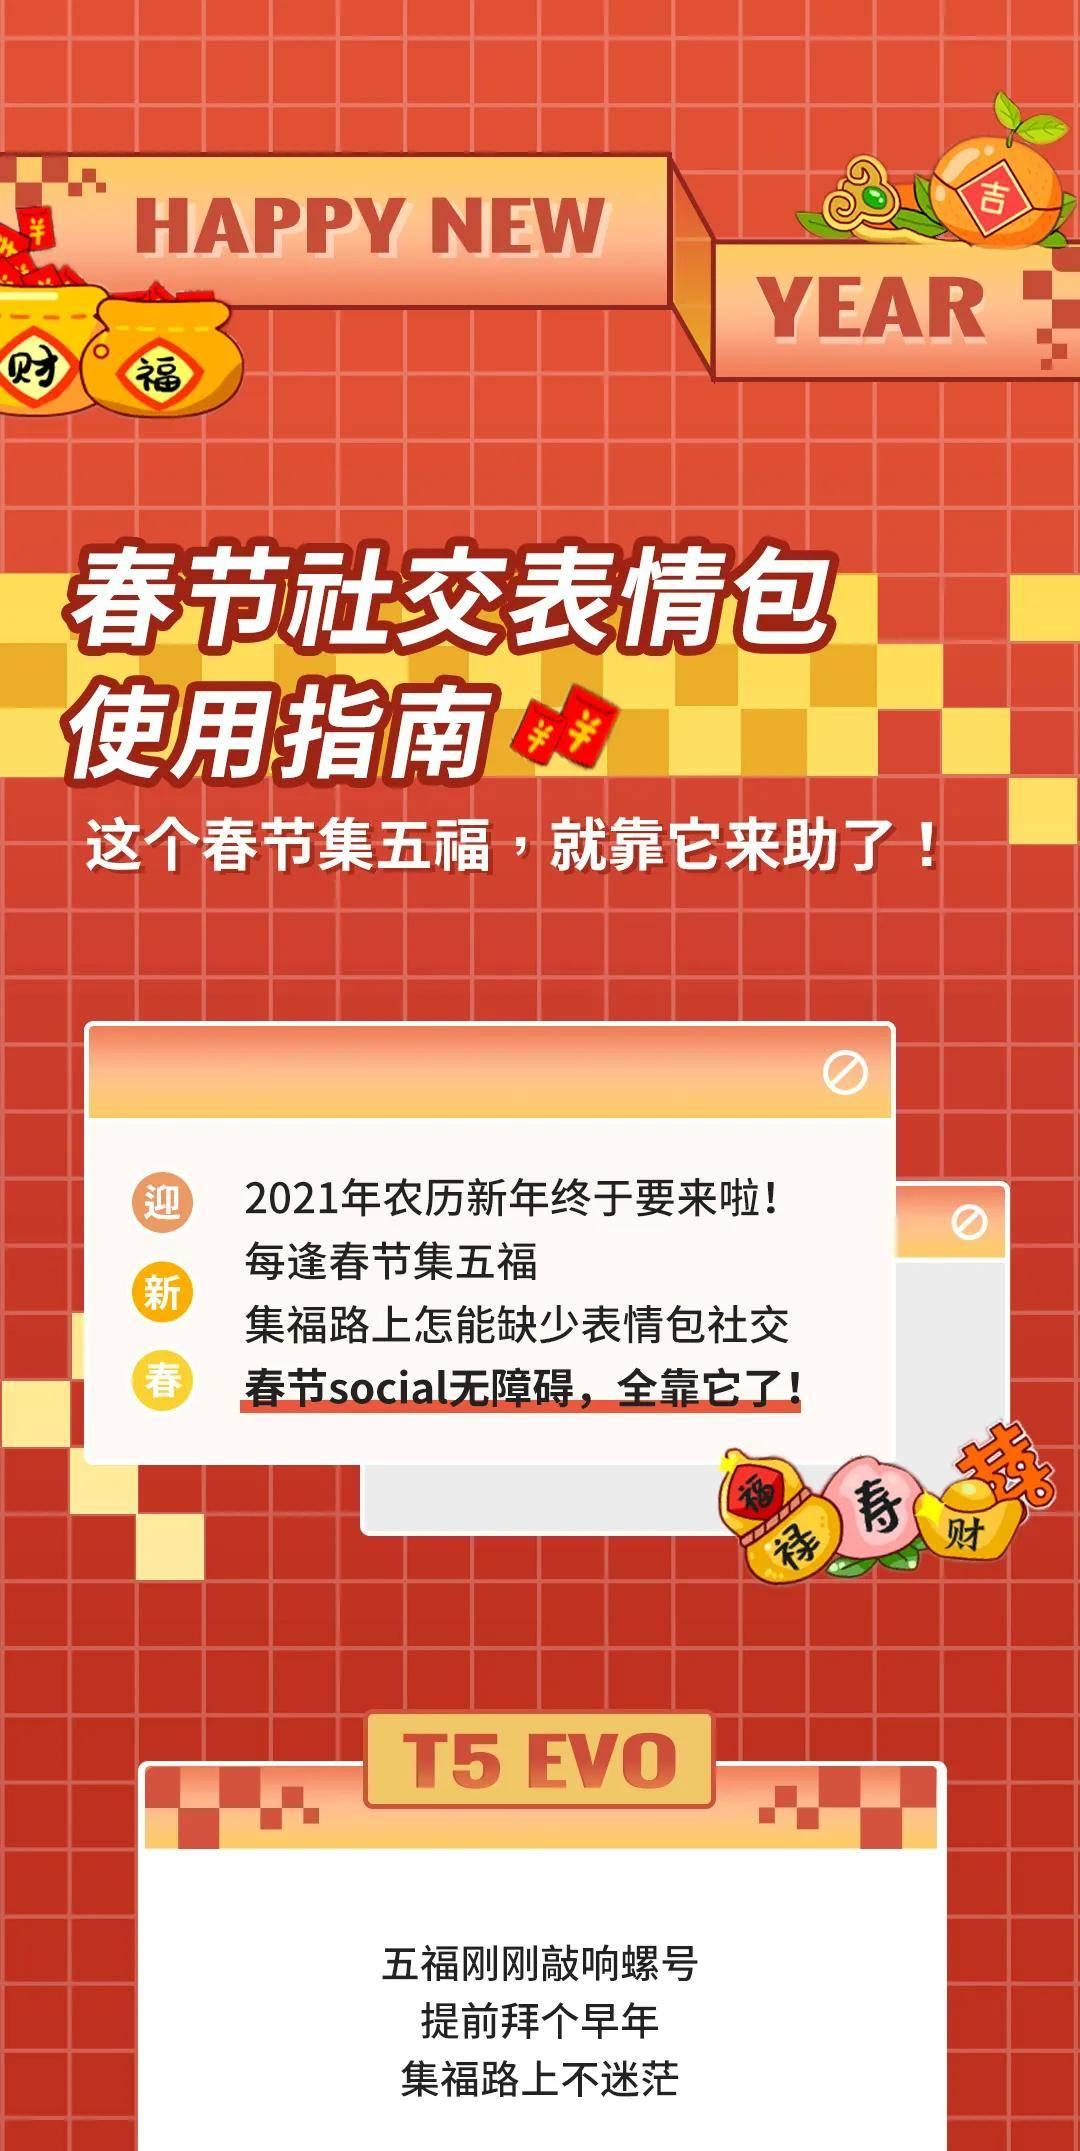 T5 EVO  春节社交表情包用户指南